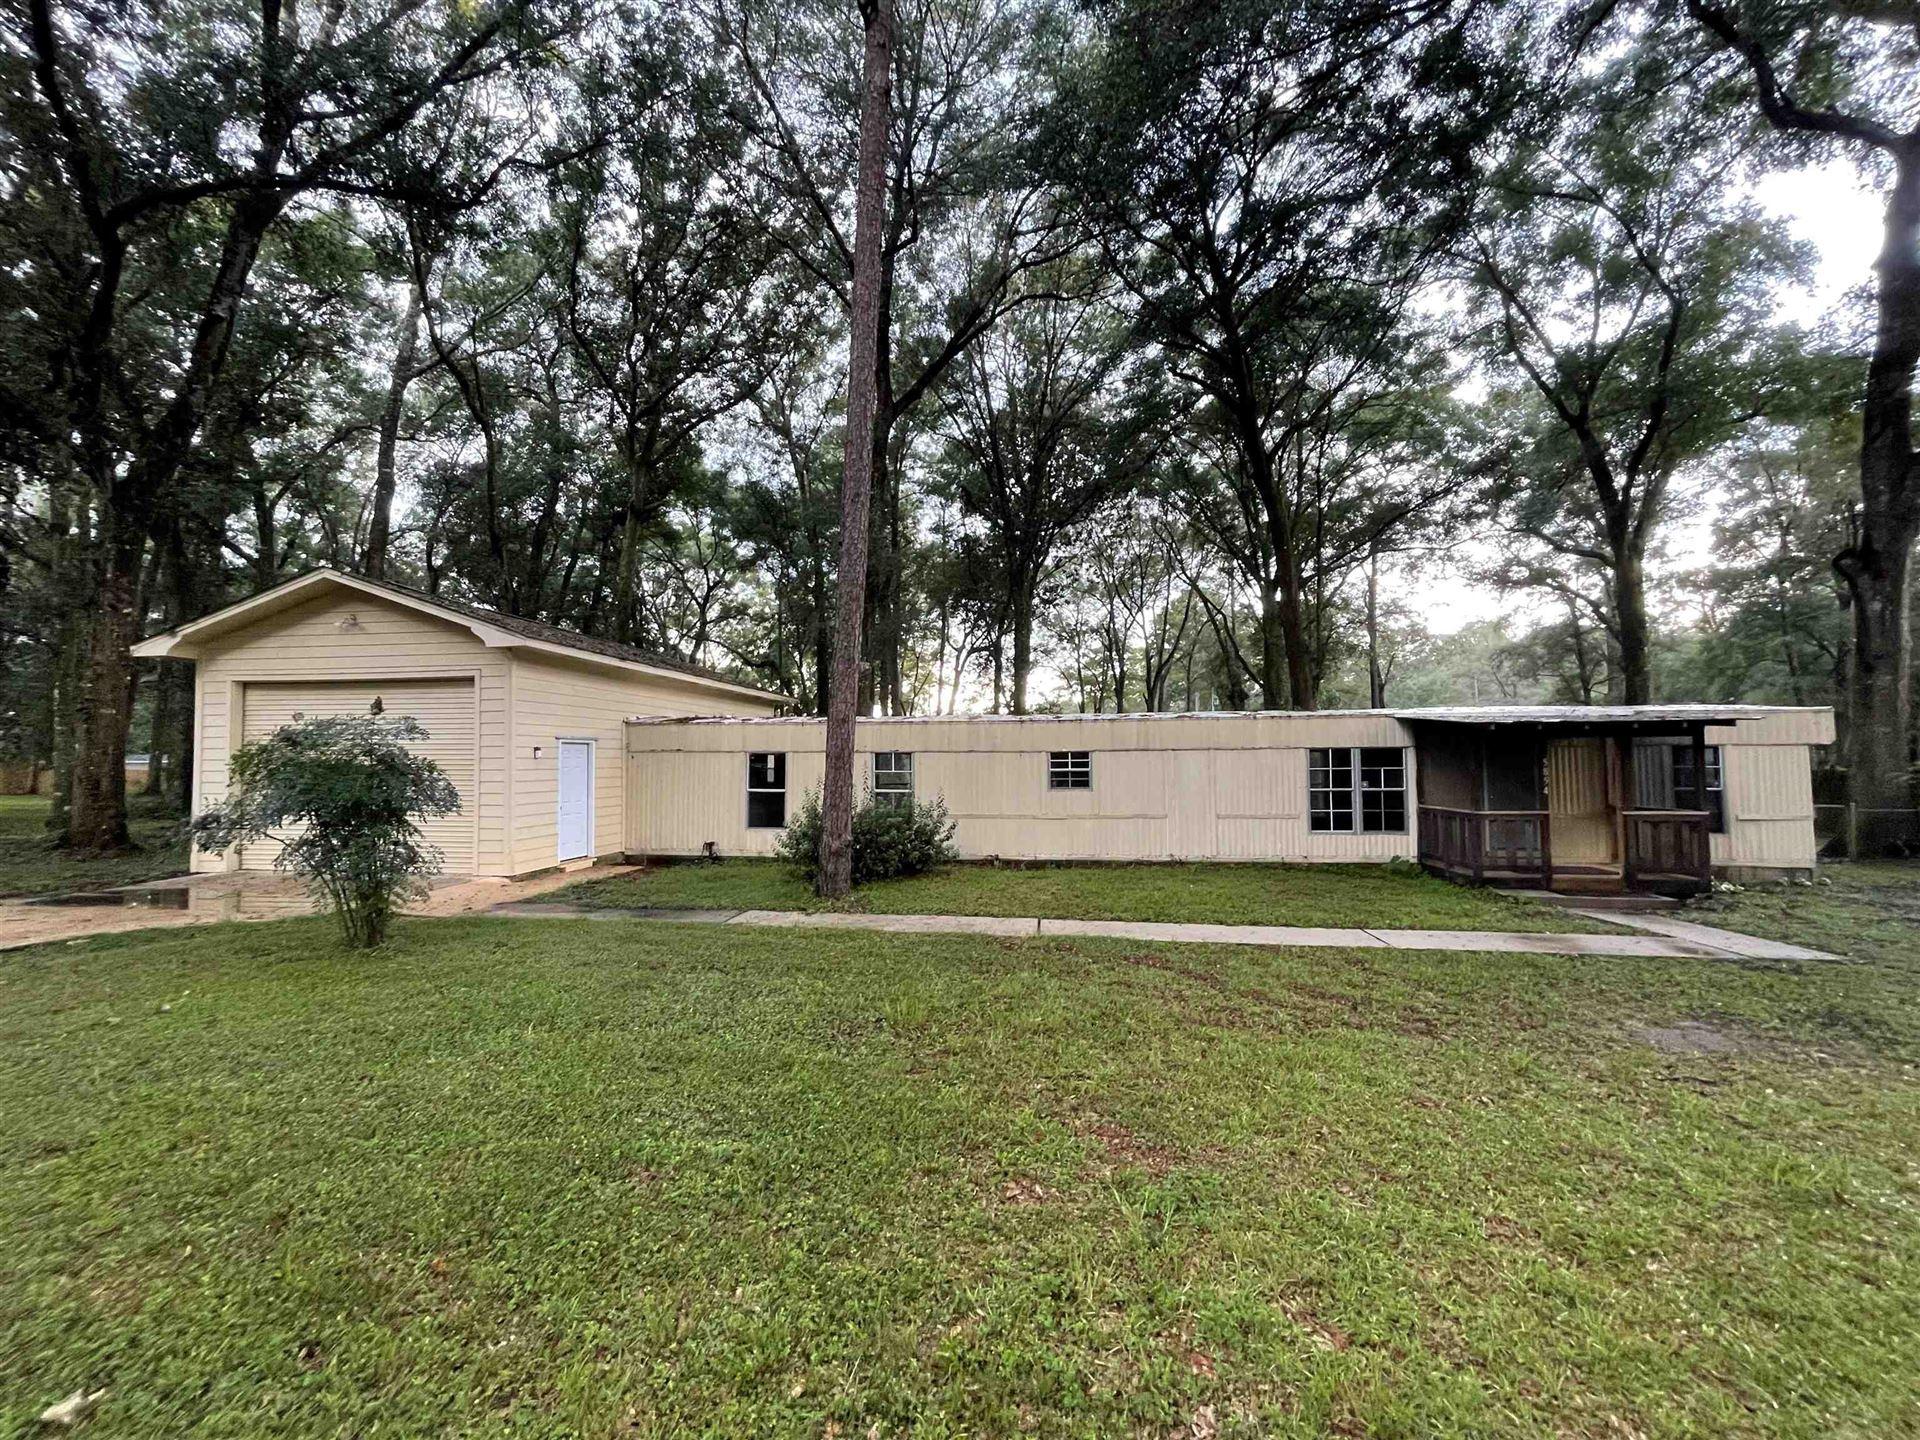 5854 Deer Park Circle, Tallahassee, FL 32311 - MLS#: 337720